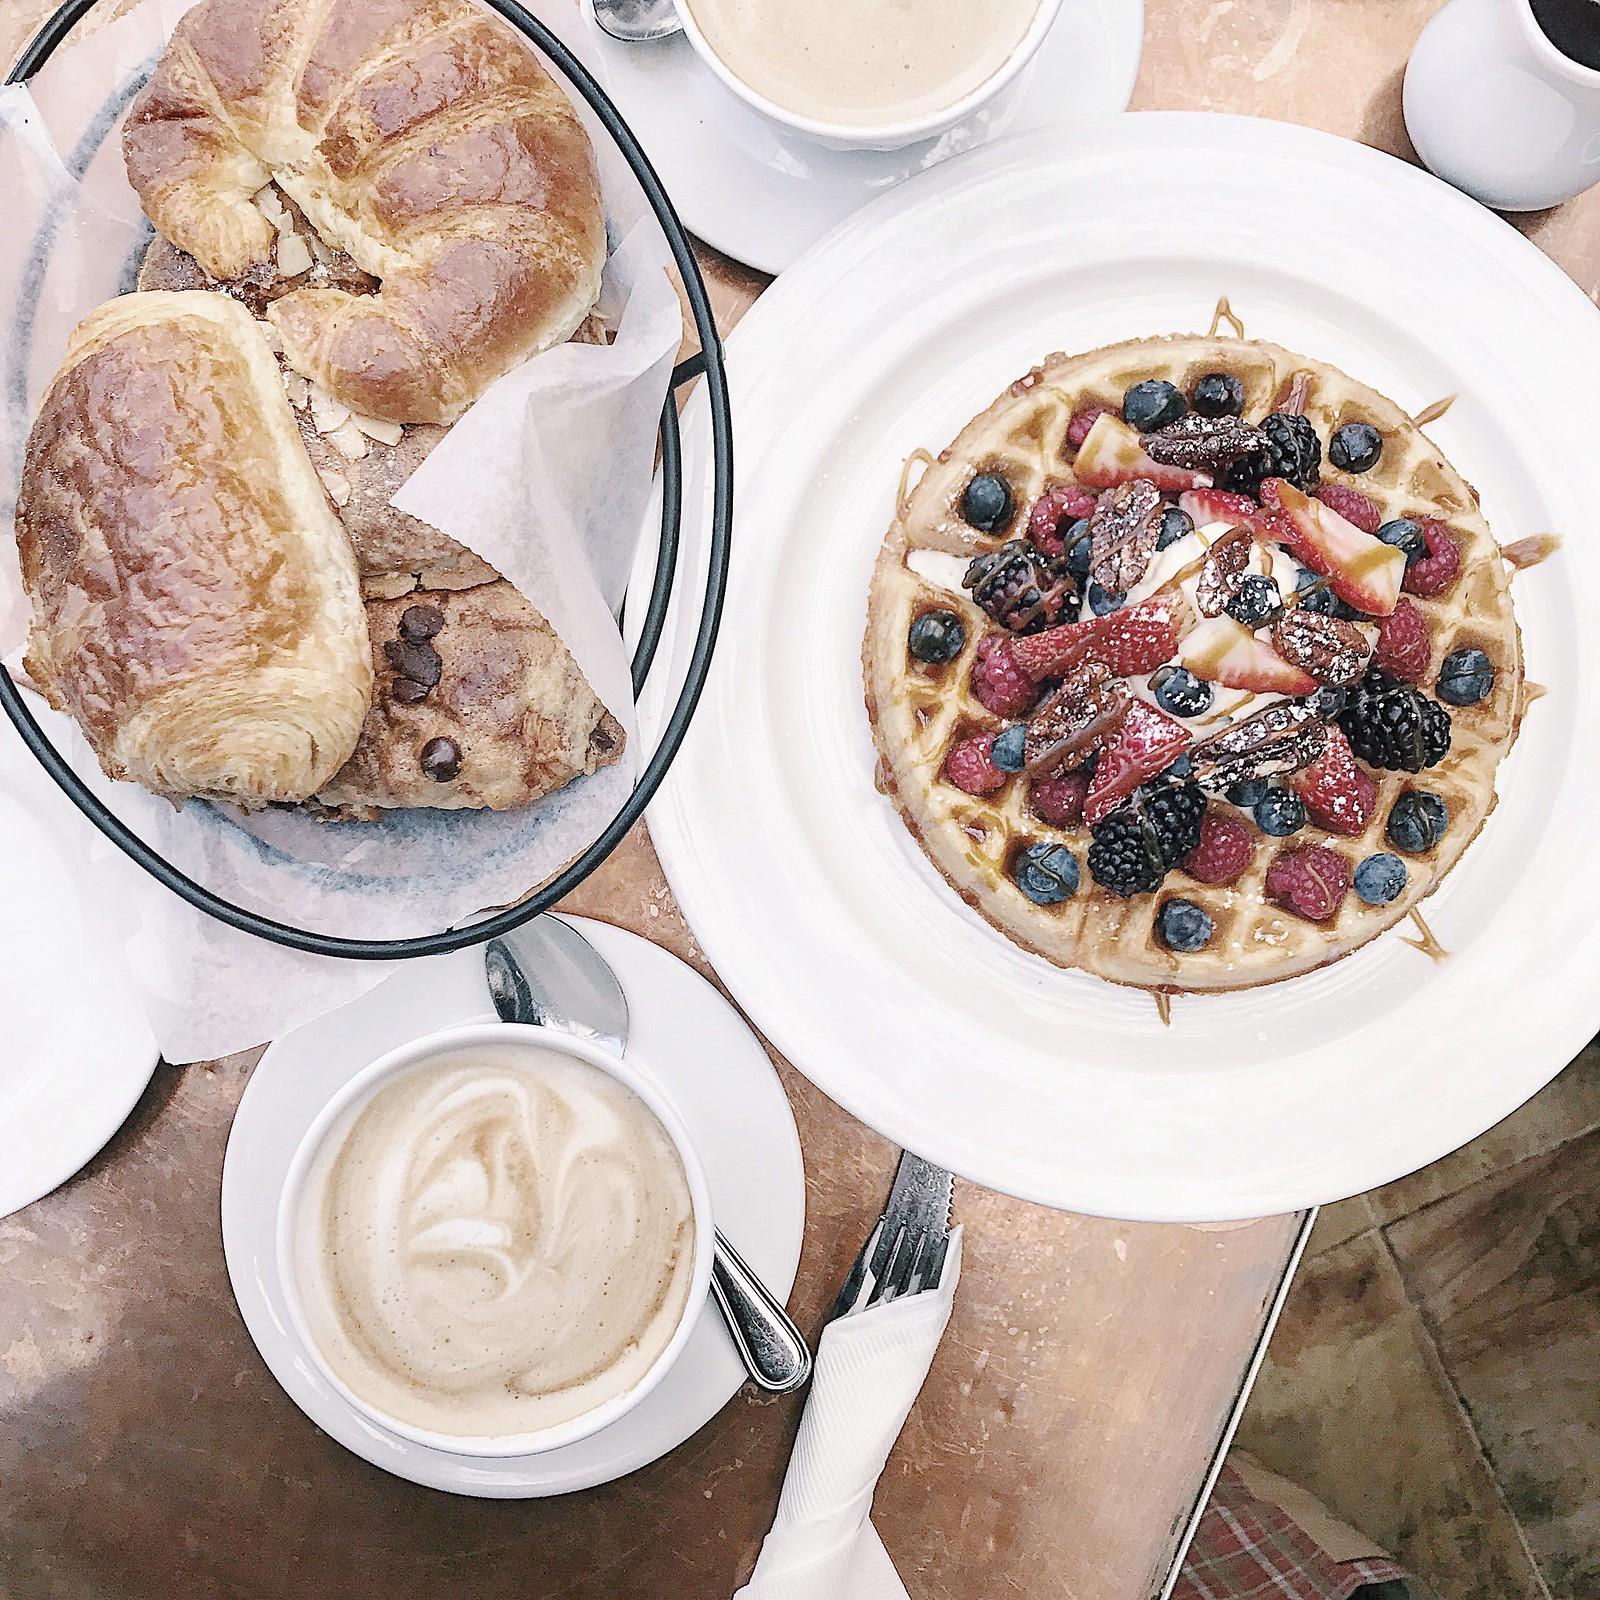 1343-little-next-door-dinela-brunch-waffles-coffee-dtla-beveryhills-losangeles-flatlay-clothestoyouuu-elizabeeetht